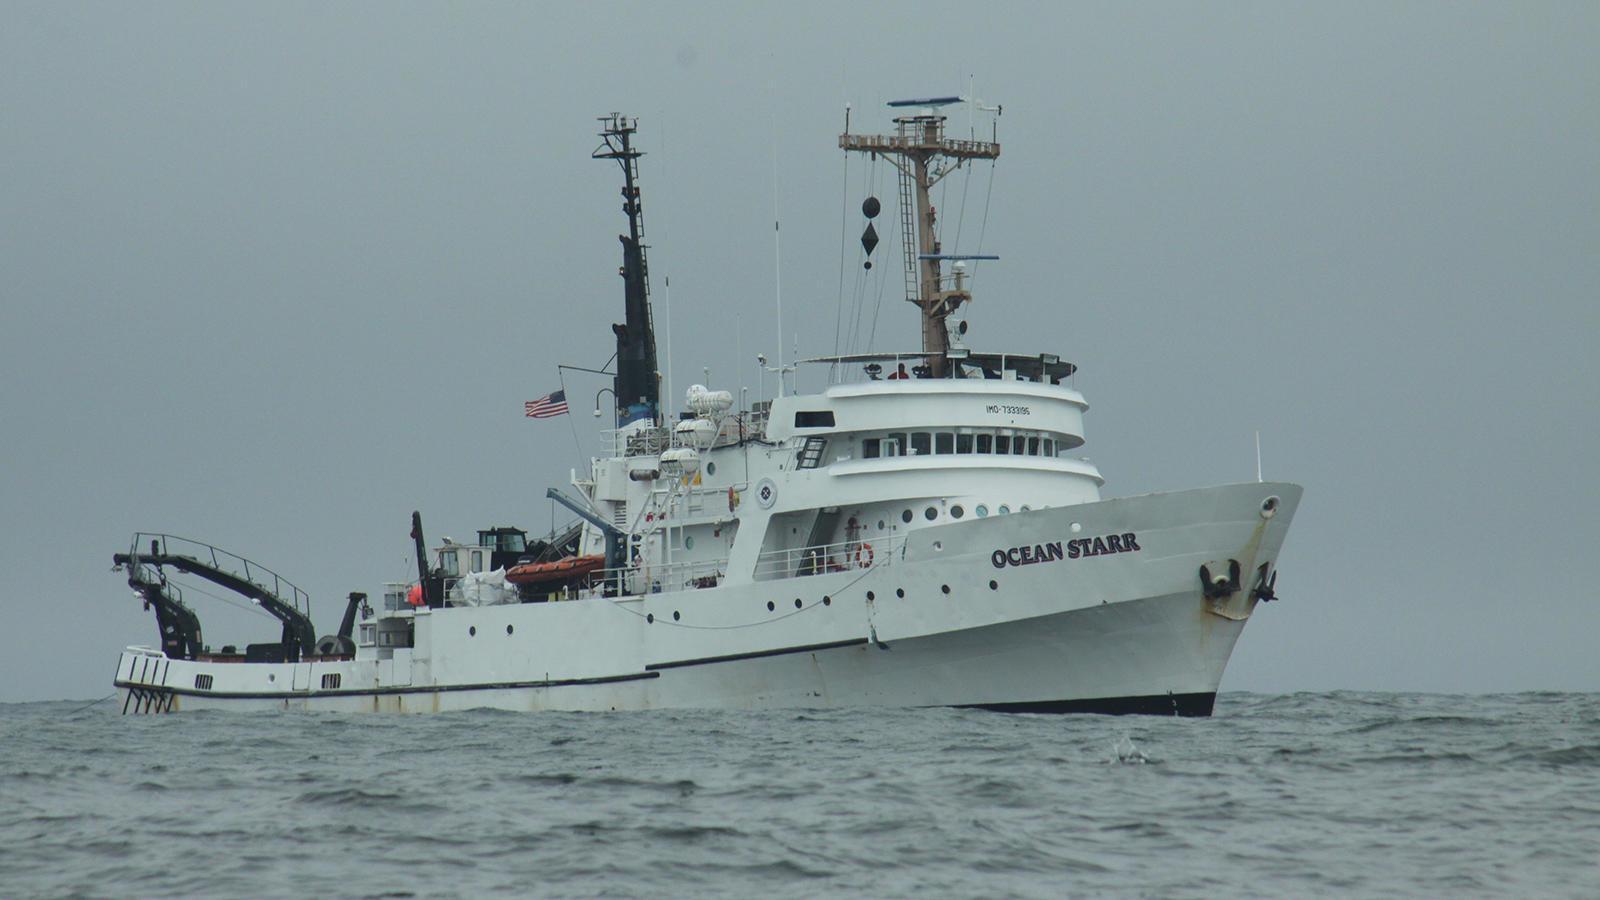 Ocean Starr - Fincantieri